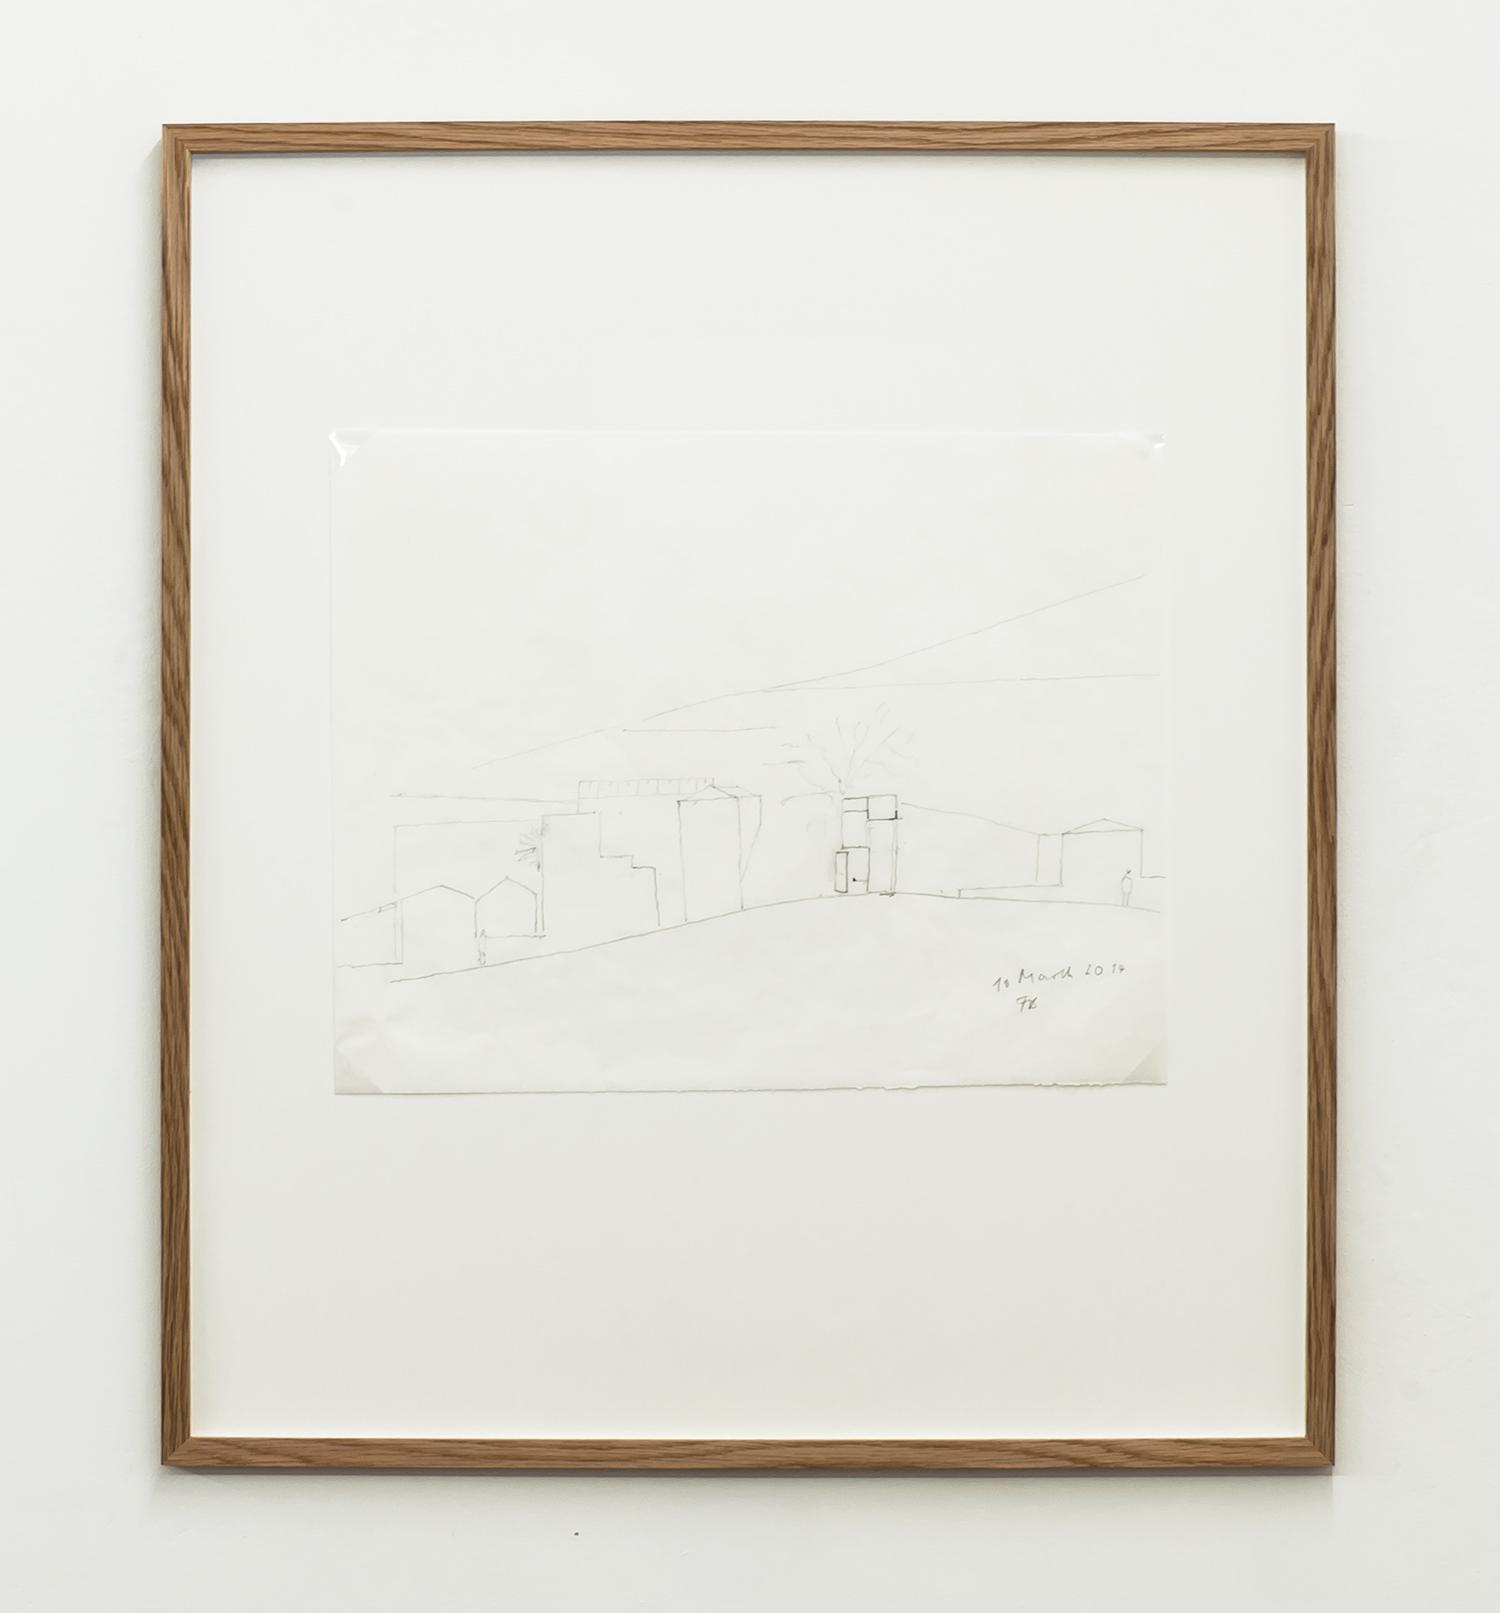 Florian Beigel,  104 Village 07_140310 , 2014, pencil on greaseproof paper, 298 x 375 mm